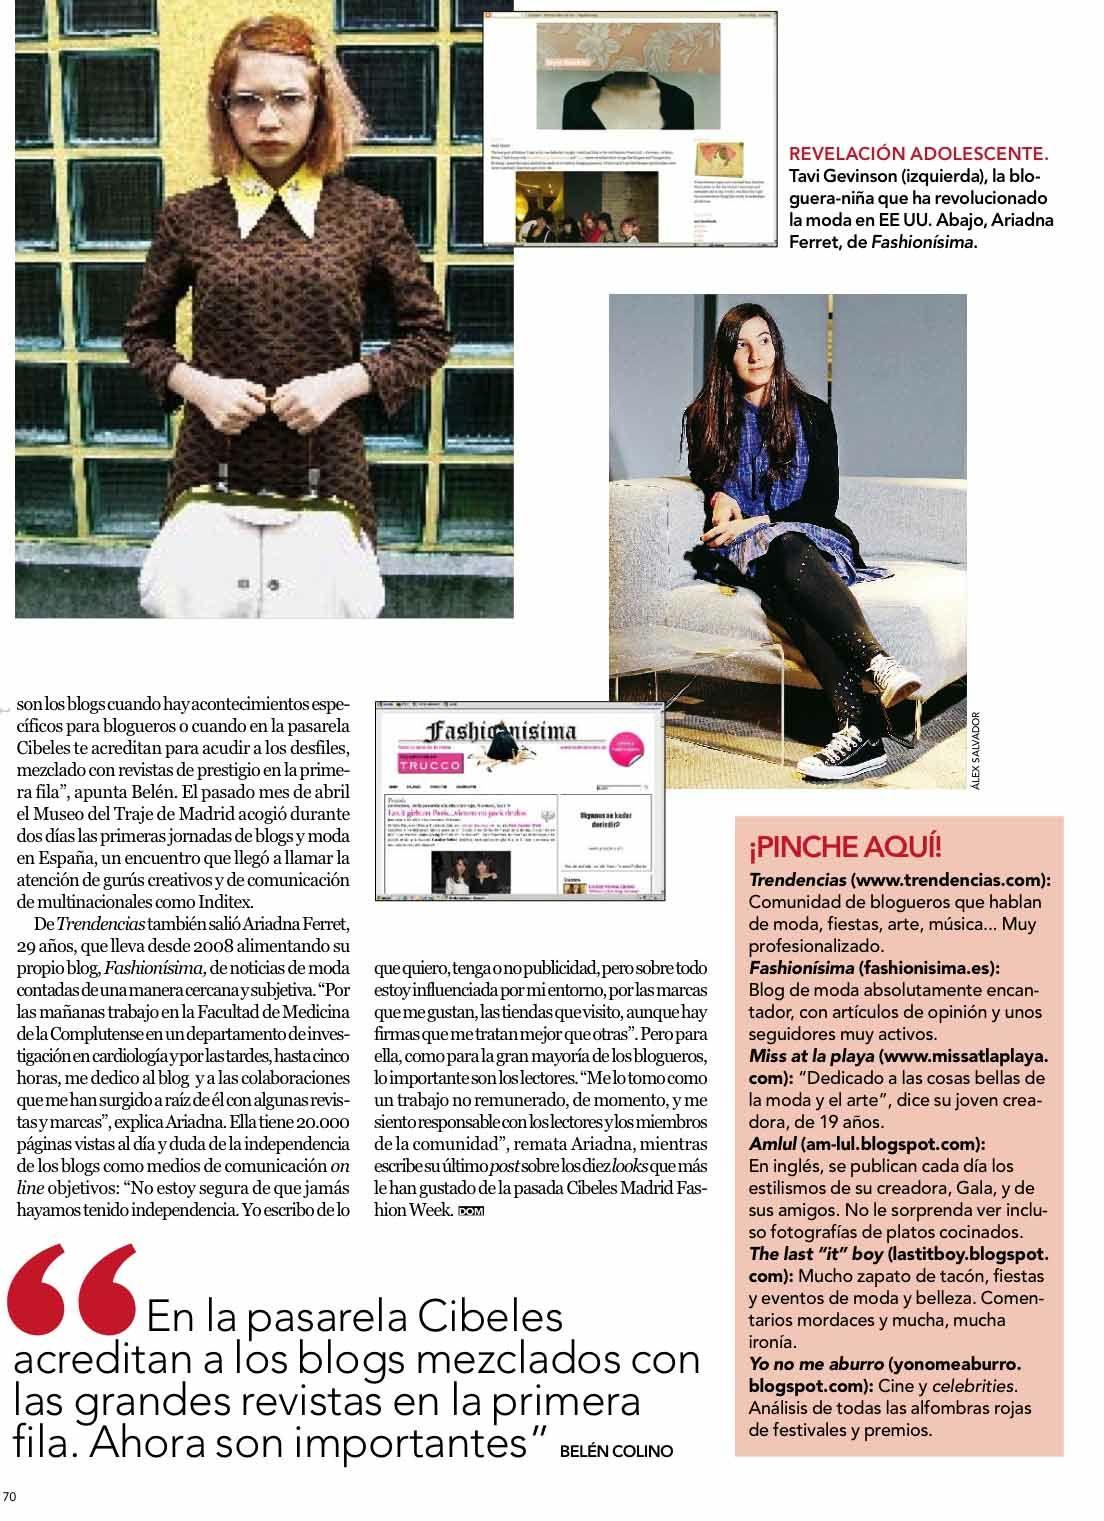 http://yonomeaburro.blogspot.com.es/2010/10/soy-bloguero-de-moda-reportaje-en.html